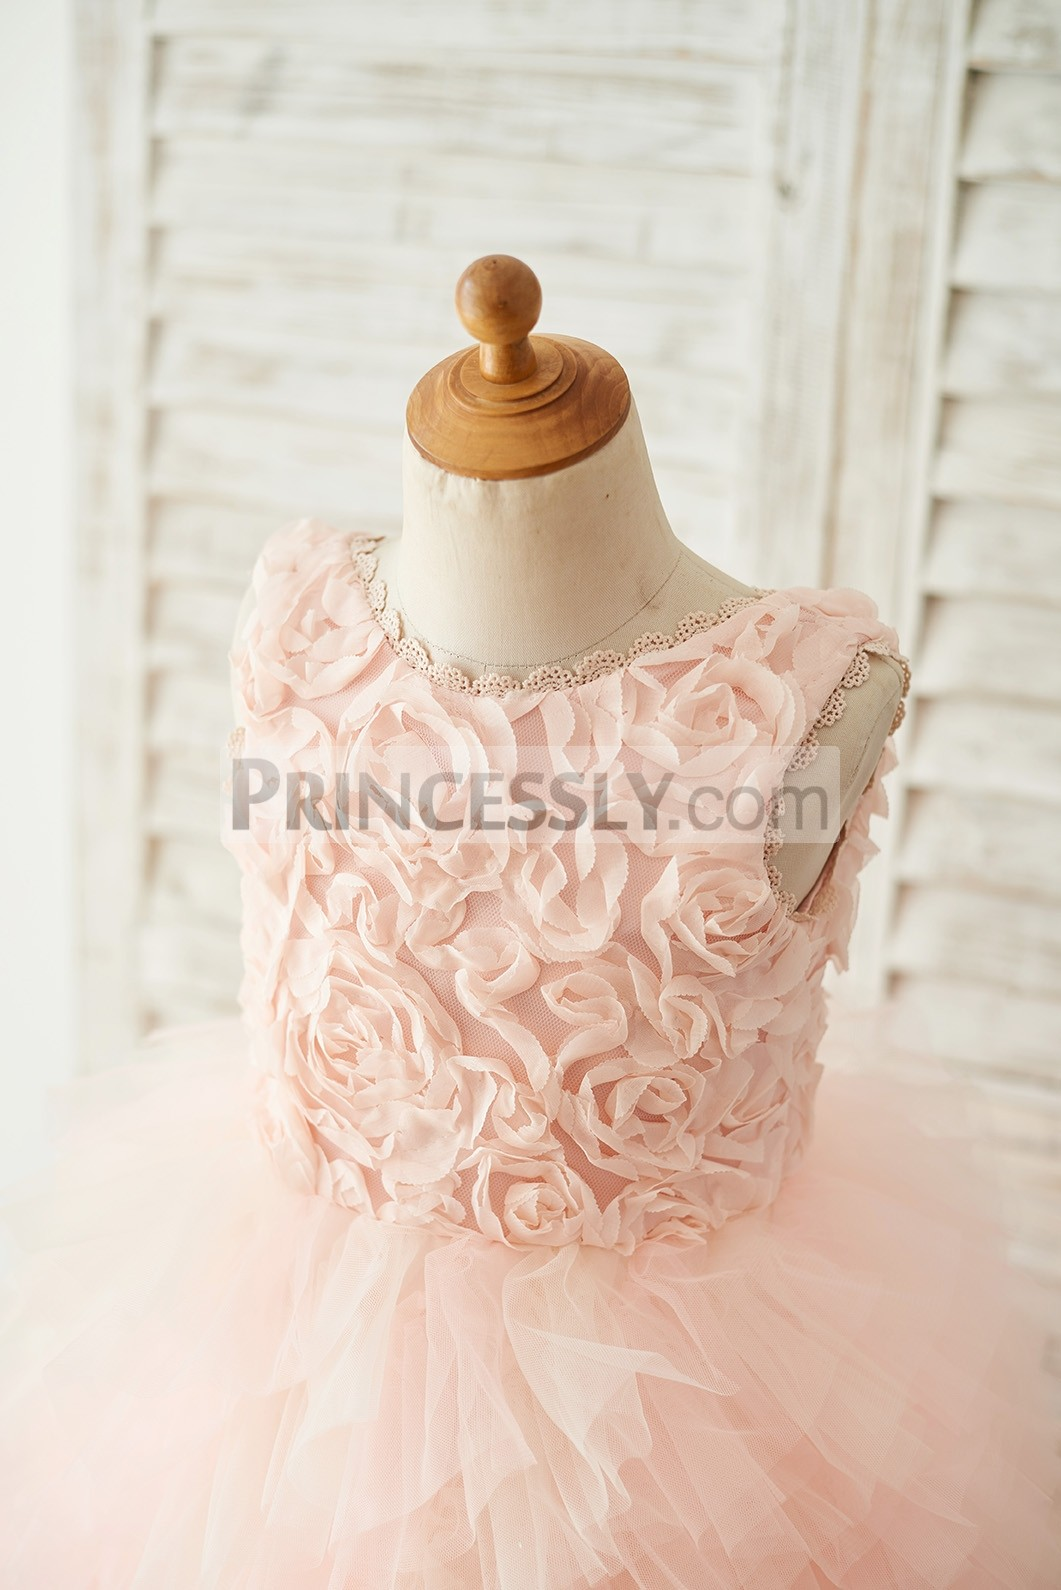 Rosette bodice with scalloped lace jewel neck, sleeveless